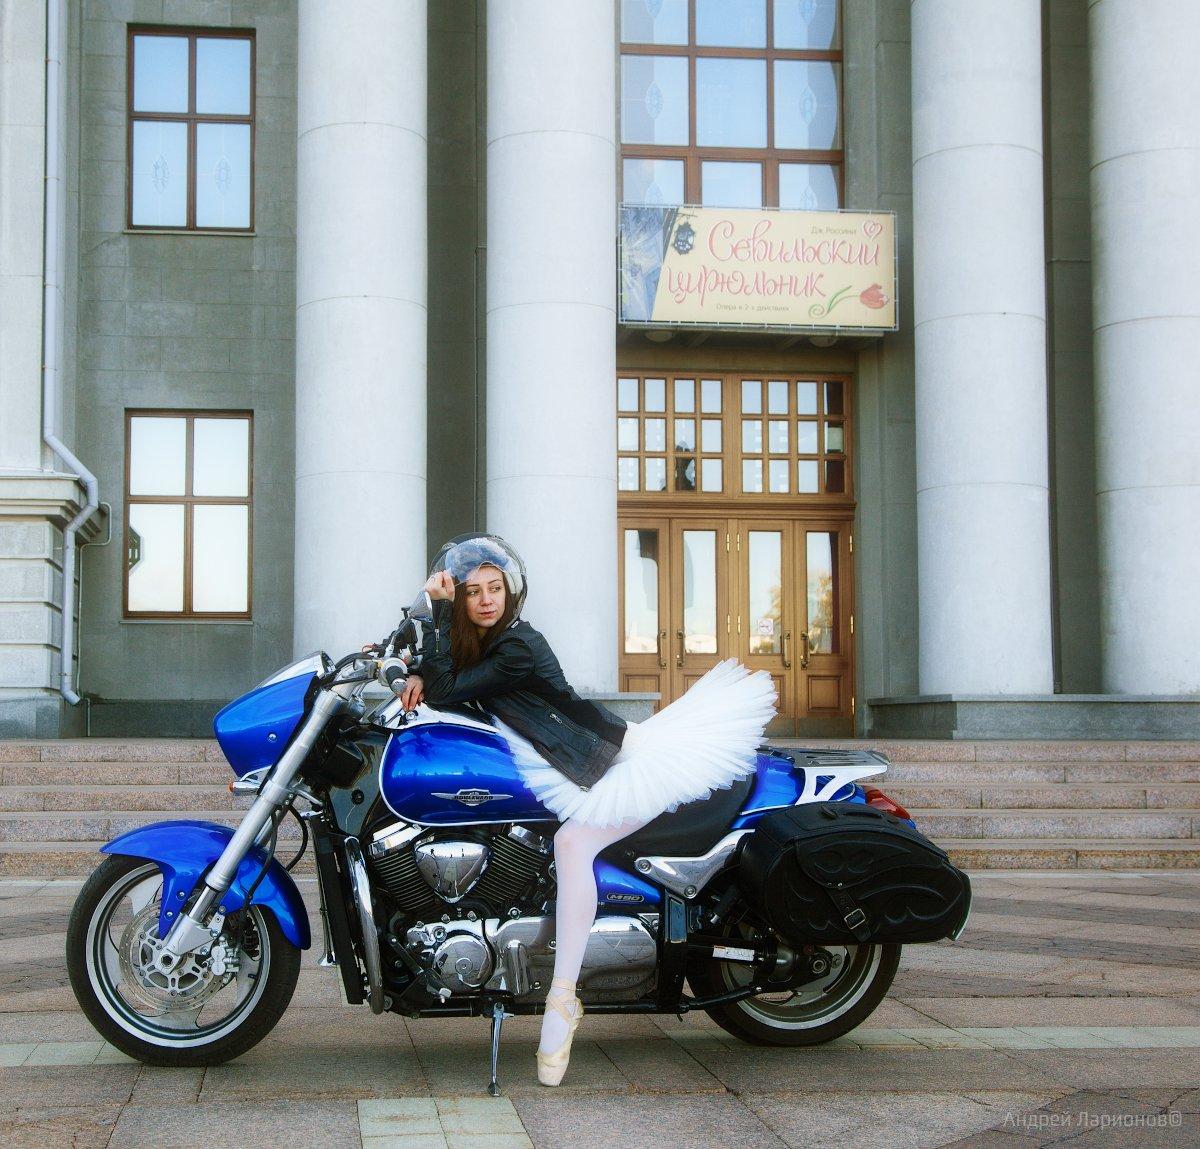 балерина, балет, байк, мотоцикл, театр, андрейларионов, девушка, портрет, Андрей Ларионов